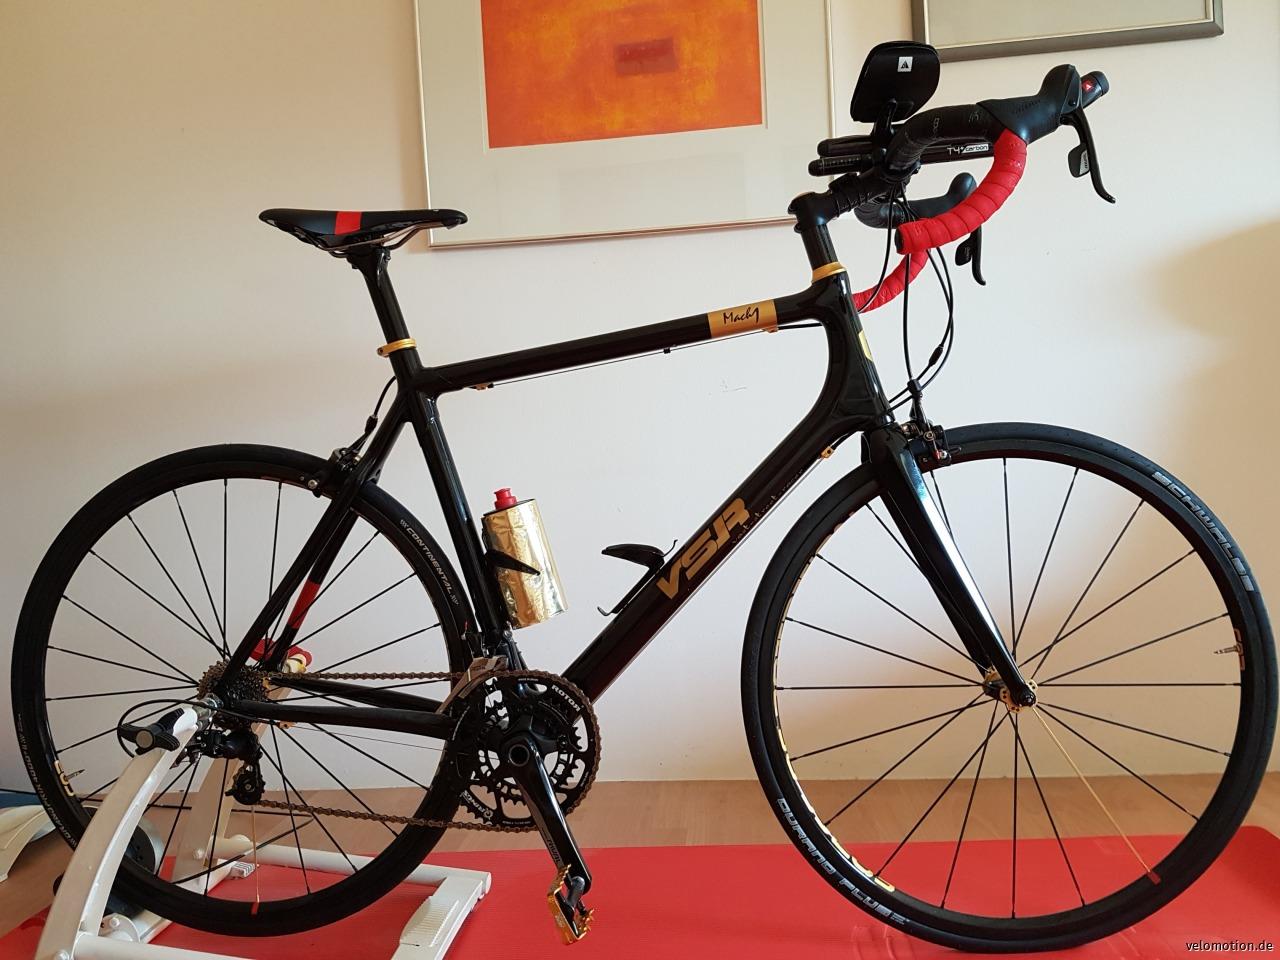 Corona zum Trotz, Voll-Carbon Rennrad